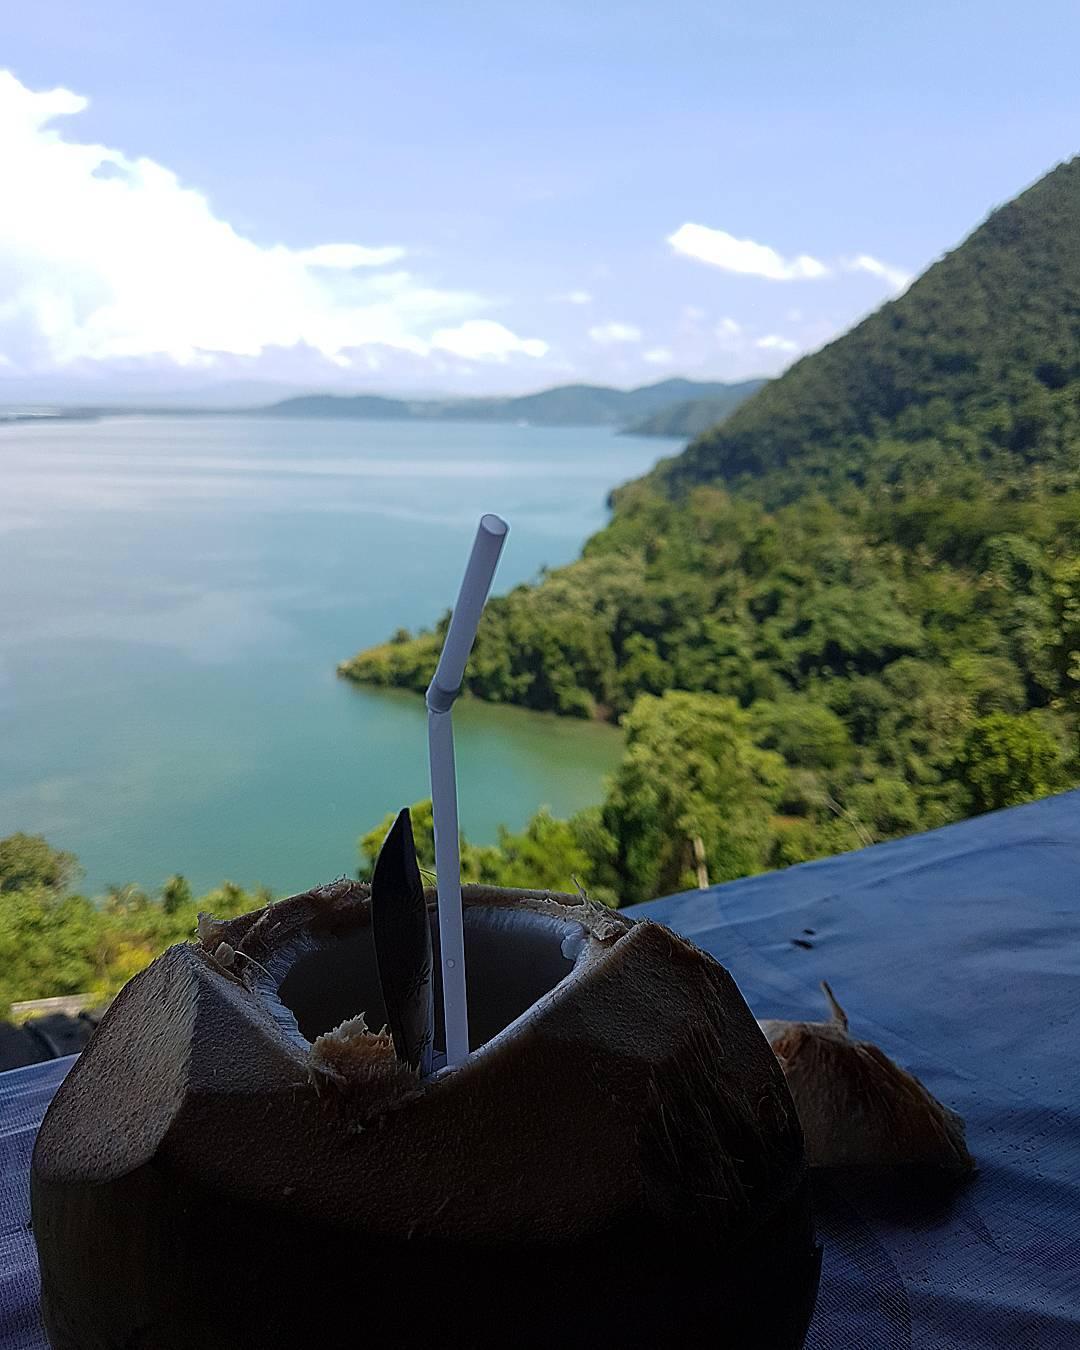 7 Wisata Jayapura Sajikan Panorama Alam Tanah Papua Menikmati Kelapa